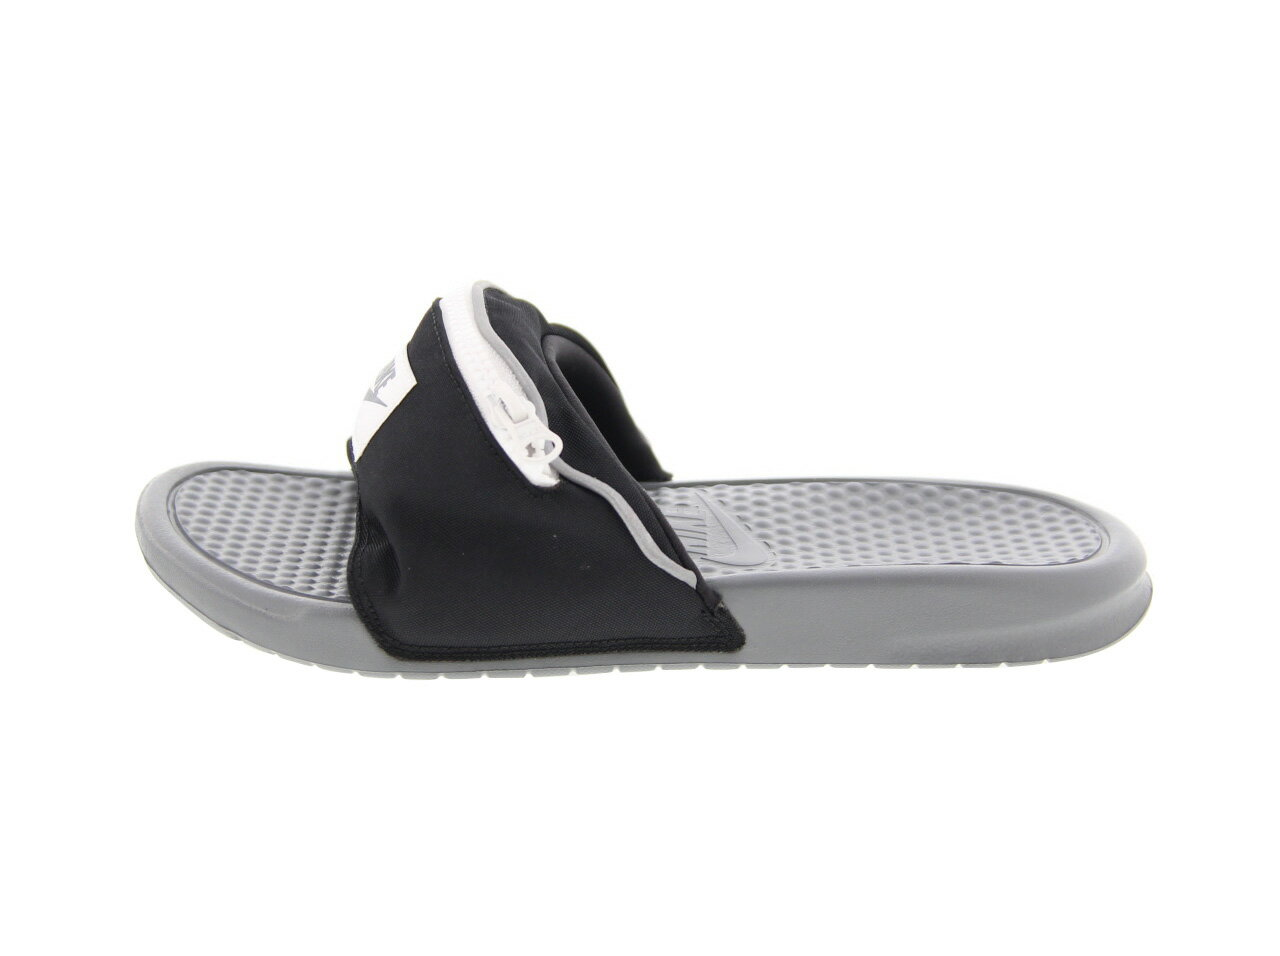 NIKE BENNASSI JDI FANNY PACK(AO1037-001)【ナイキ ベナッシ JDI ファニーパック】【メンズファッション】【レディースファッション】【サンダル】【スライド】【靴】【フットウェア】【小物入れ】